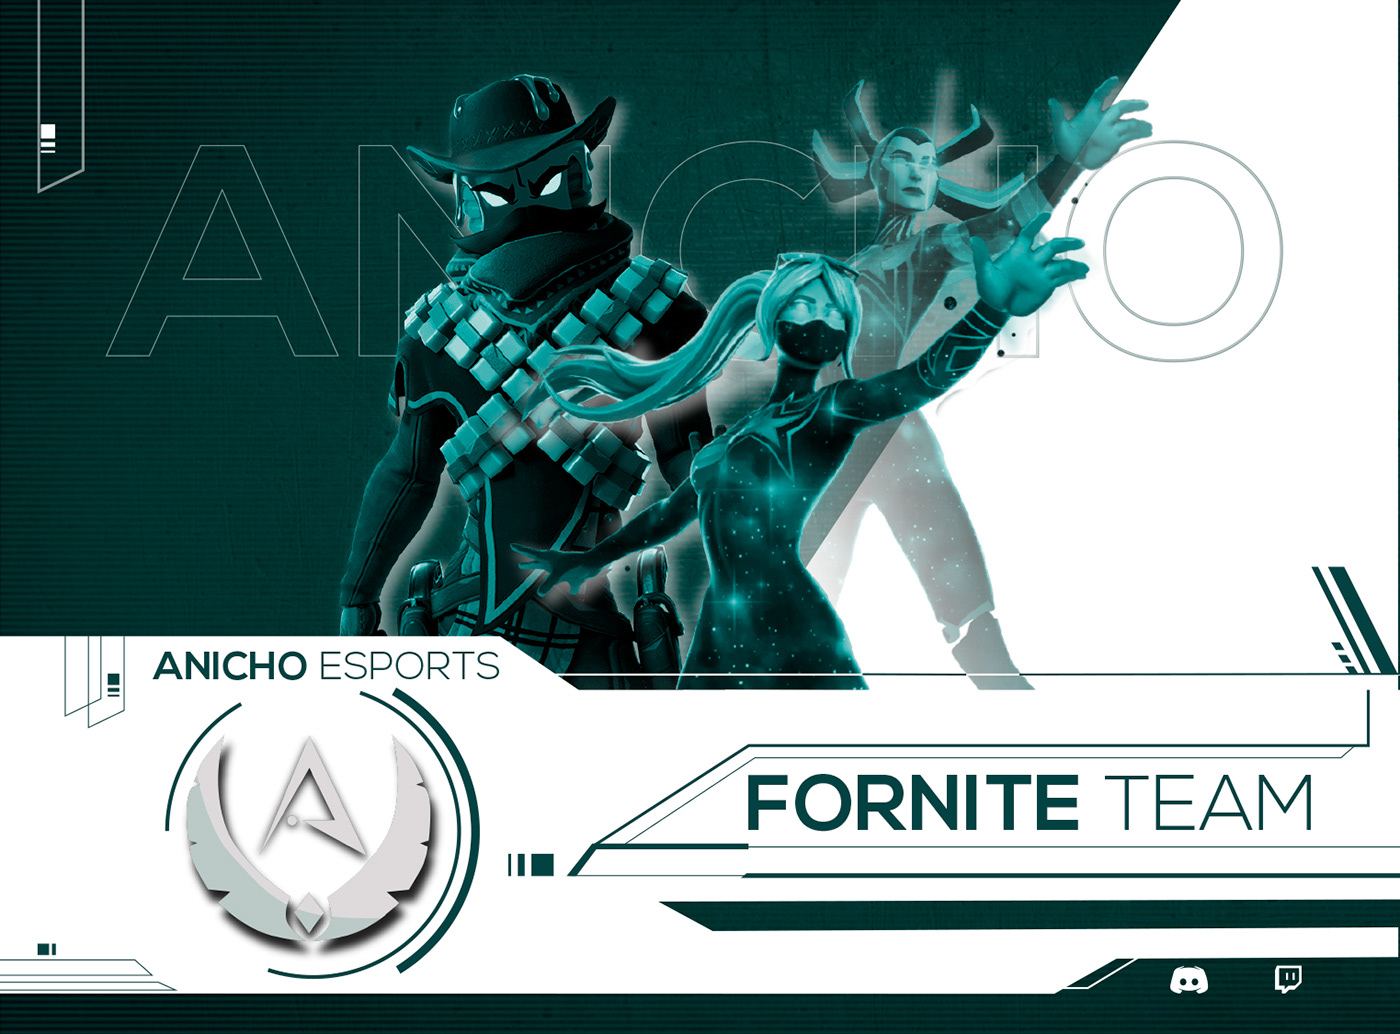 esports eSports Team fornite Gamer gaming team league of legends smash Valorant